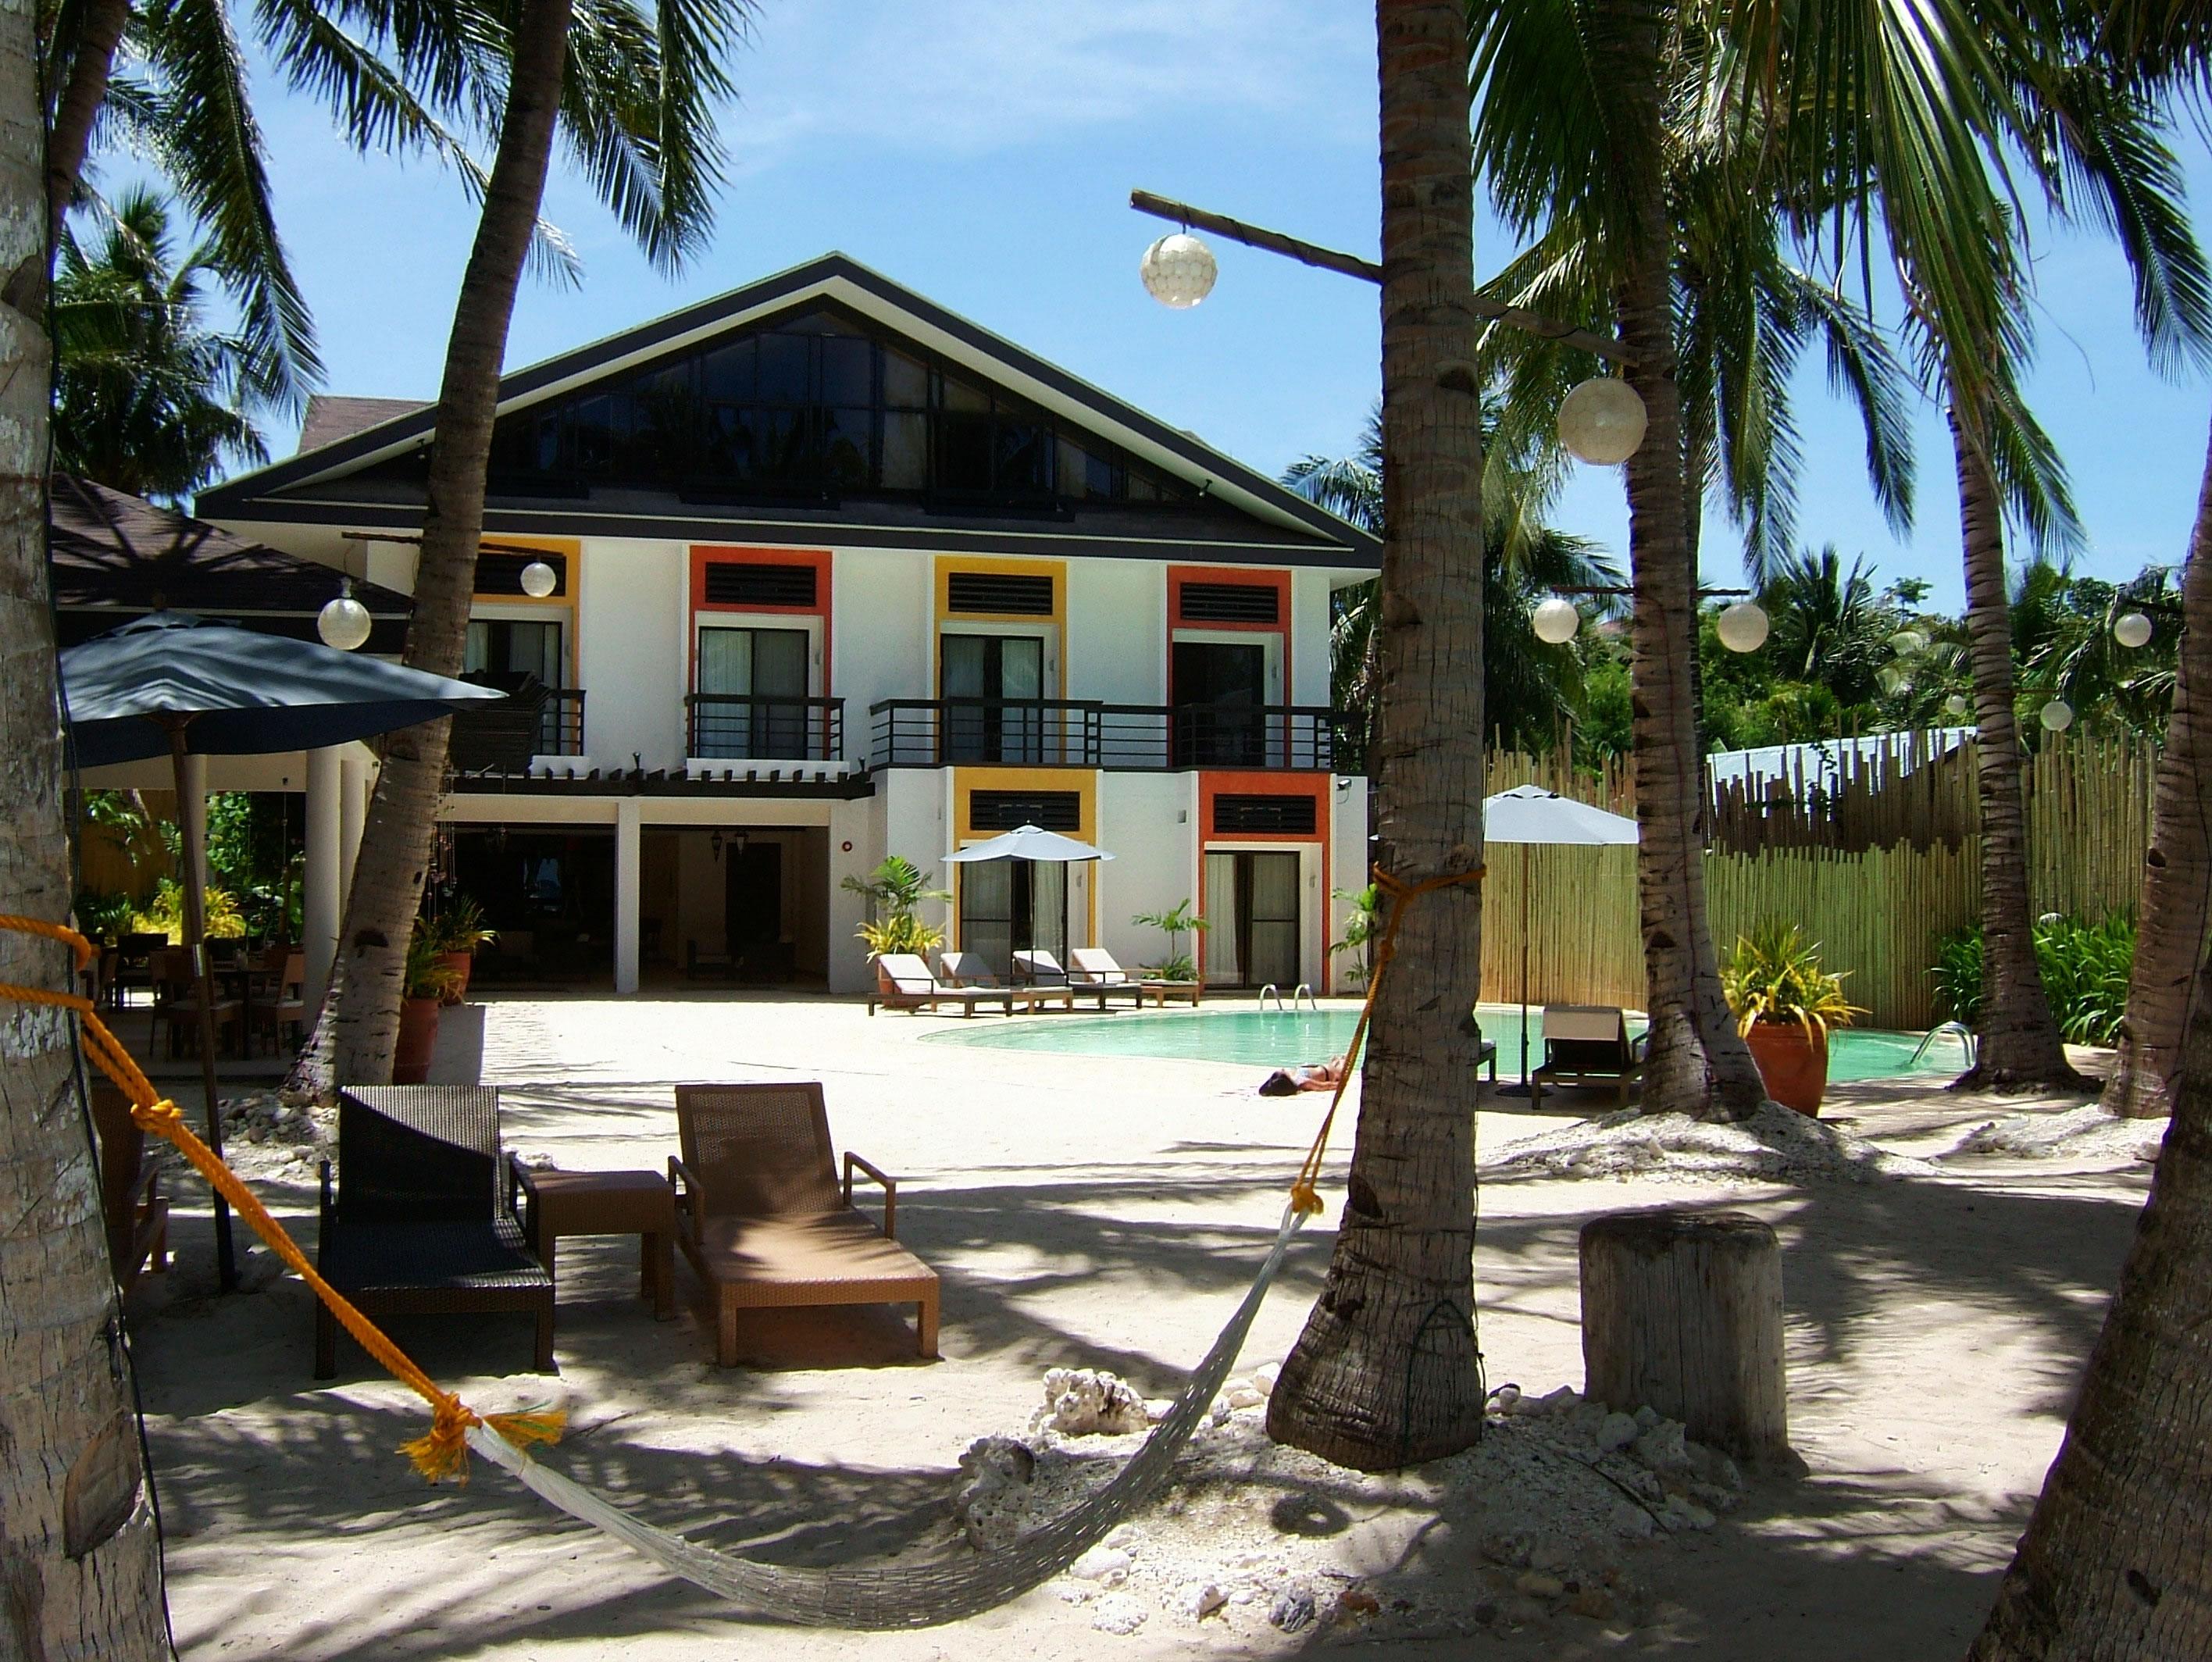 Philippines Sugar Islands Caticlan Boracay Punta bunga beach Resorts Microtel May 2007 01